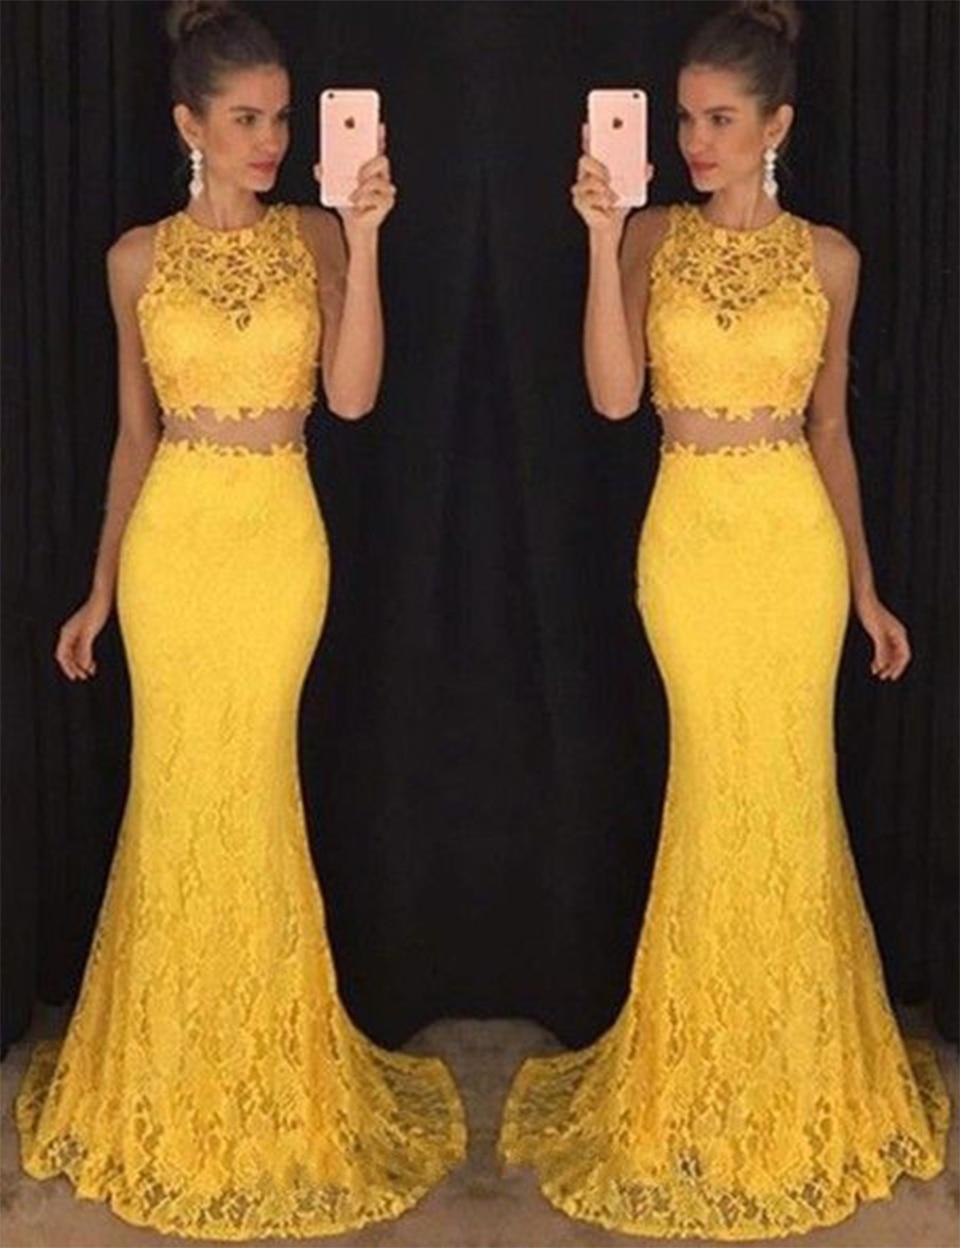 Look - Prom Elegant dresses mermaid pictures video